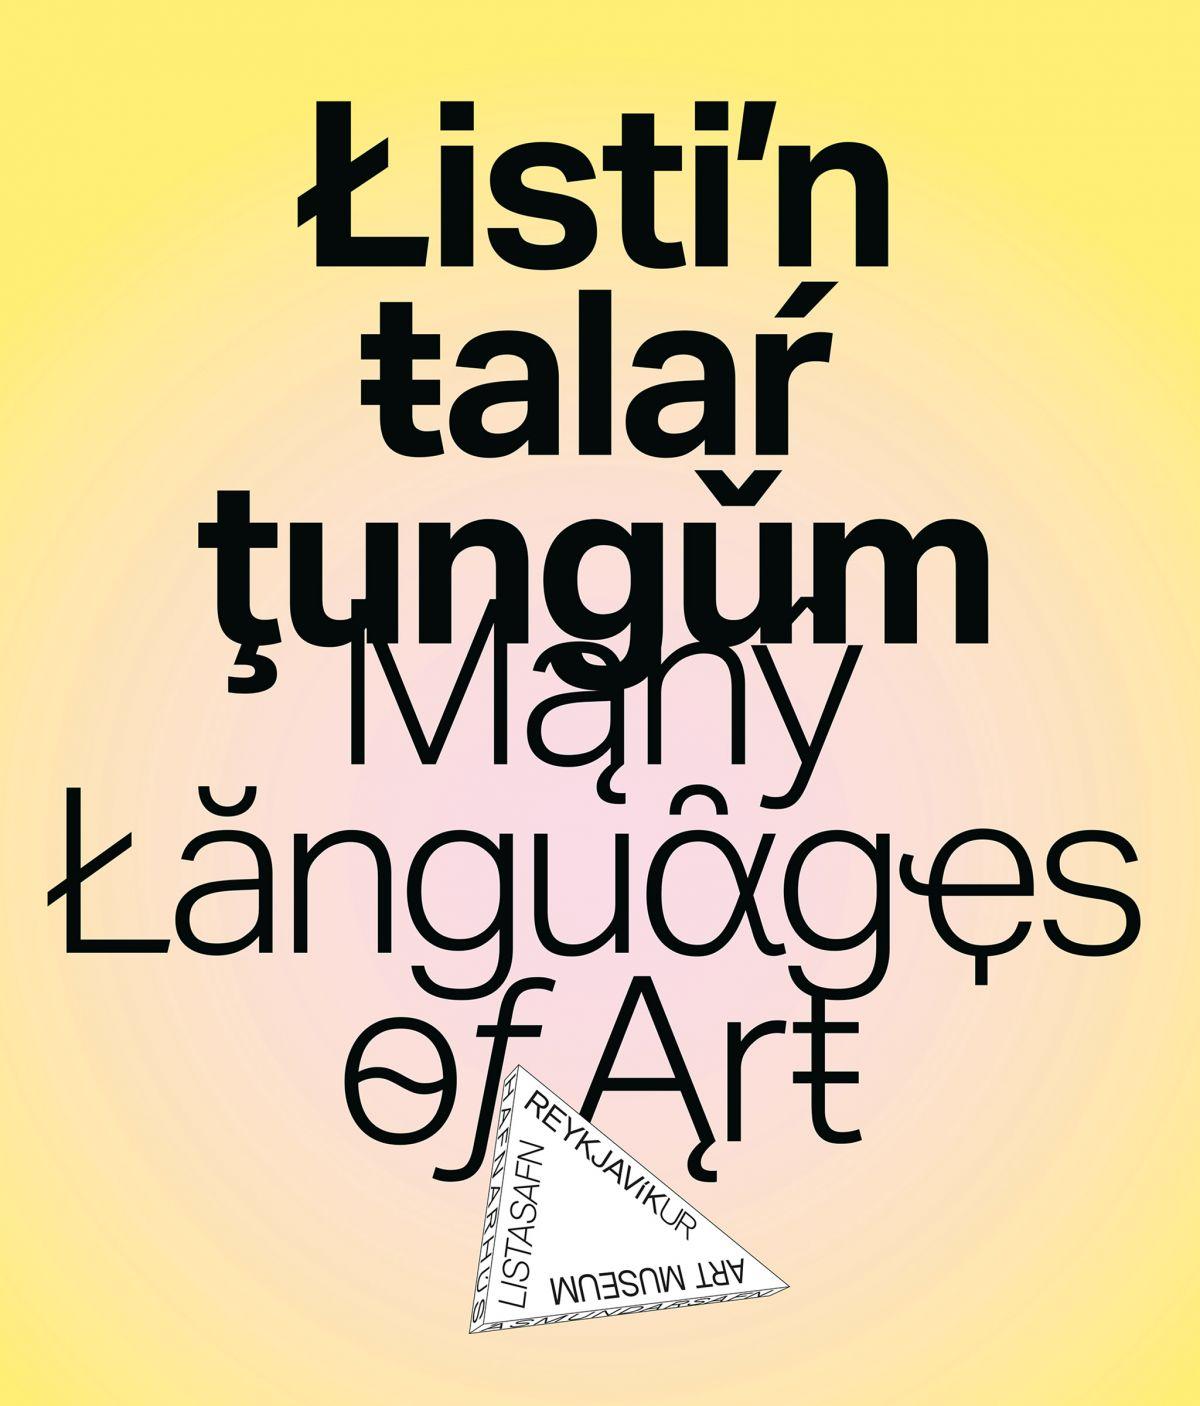 Listin talar tungum / Many Languages of Art